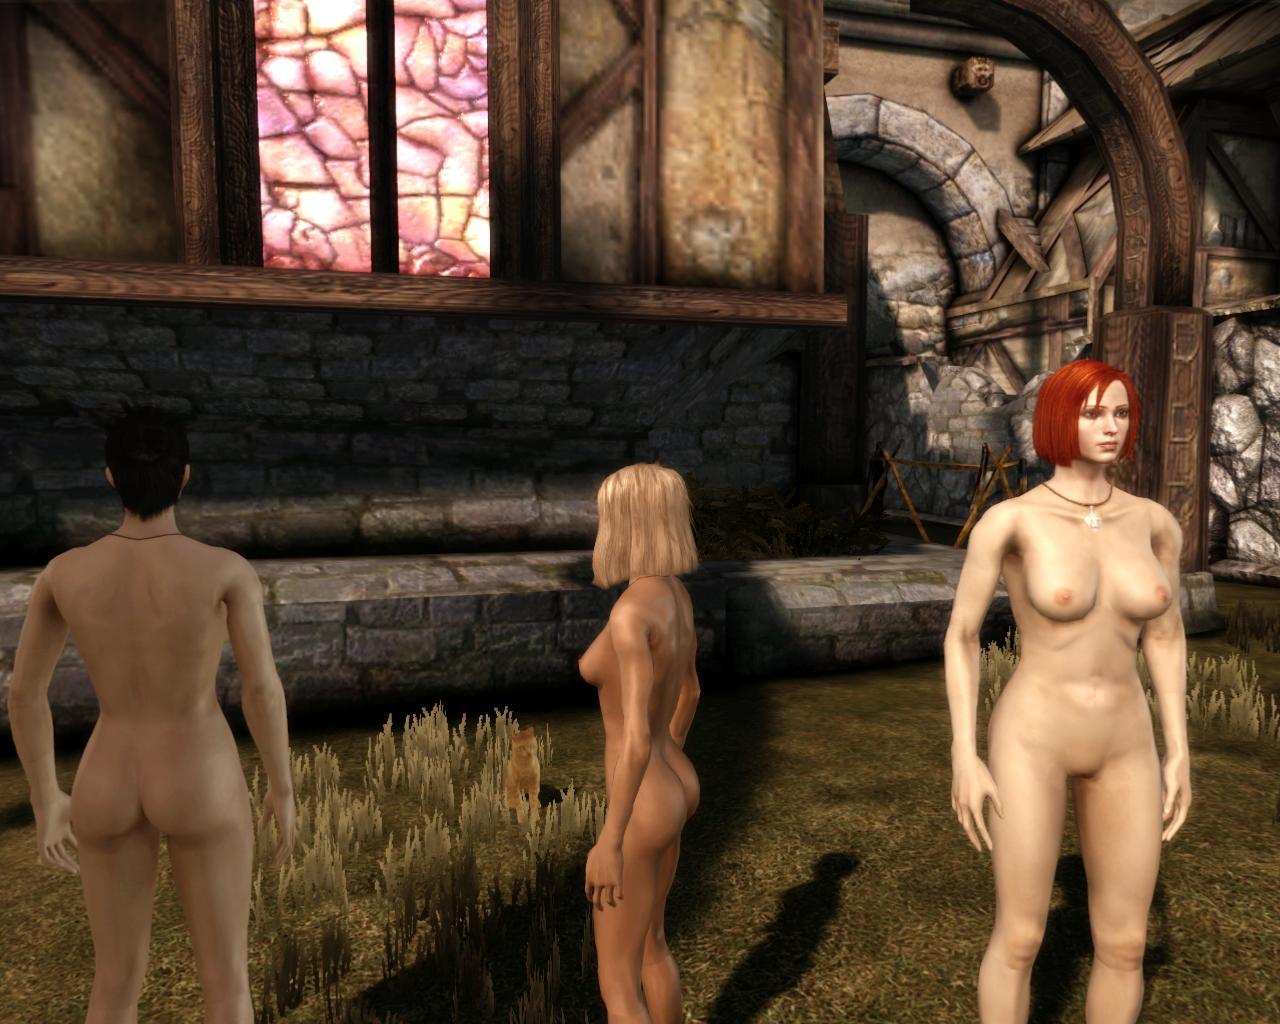 demon dragon desire origins age Robot on the road nude